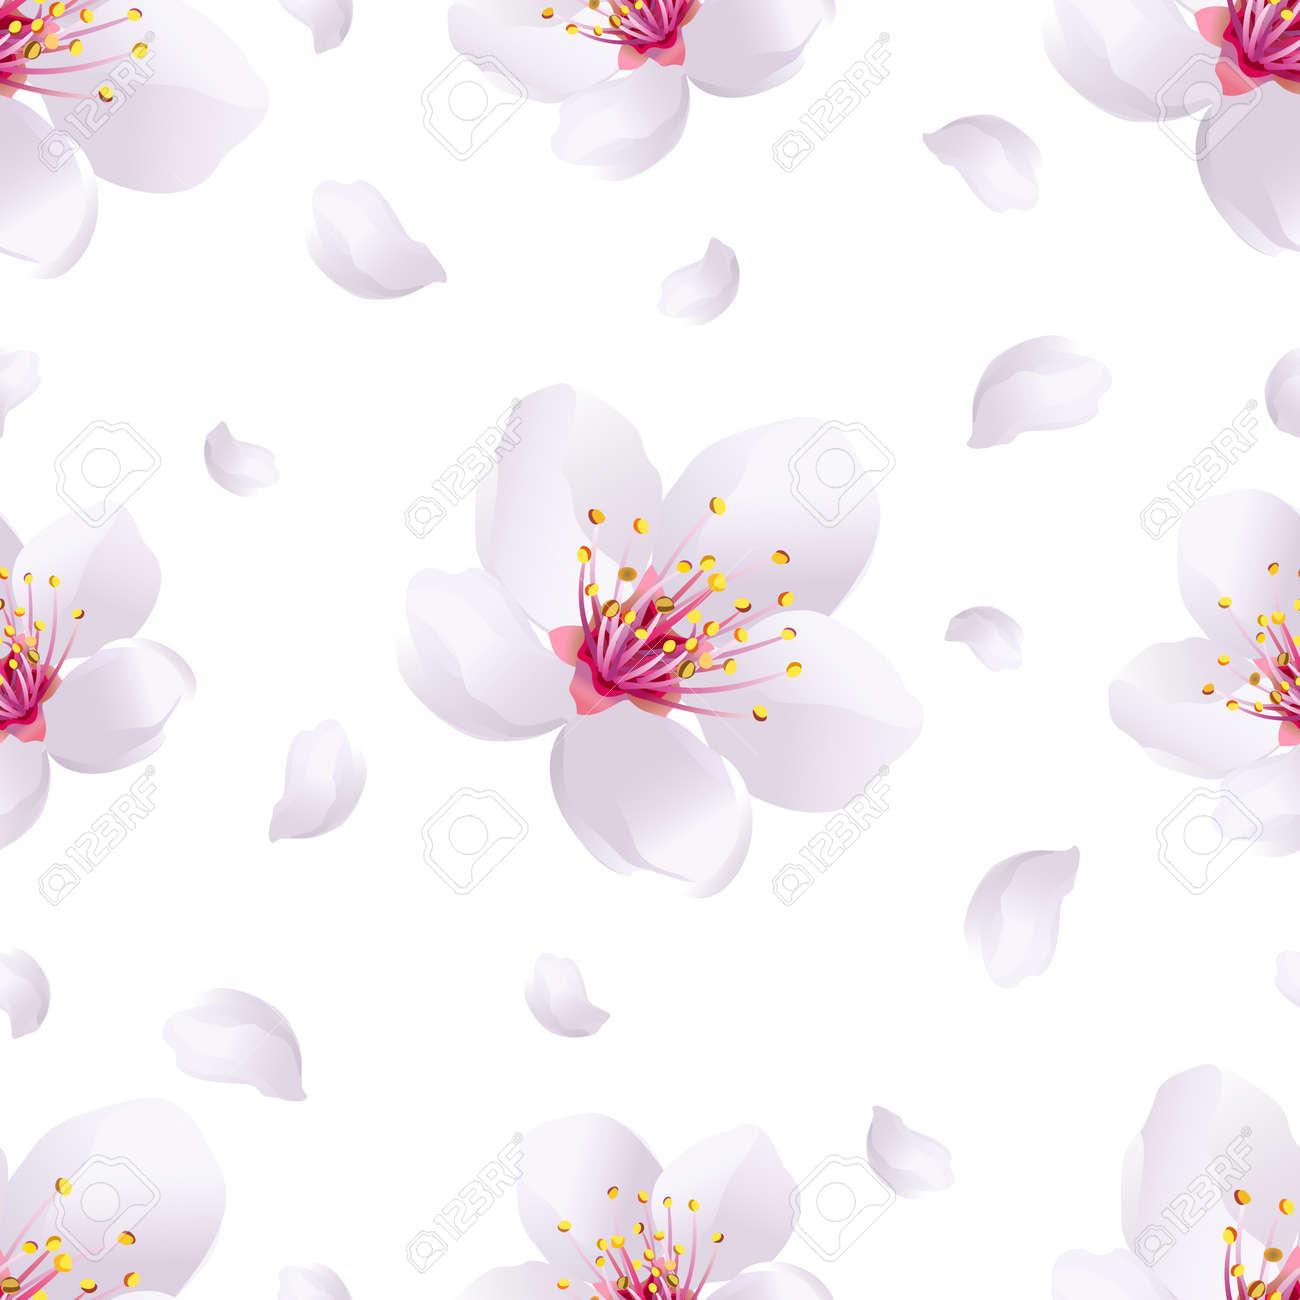 Belle Lumiere Fond De Printemps Seamless Blanc Sakura Blossom